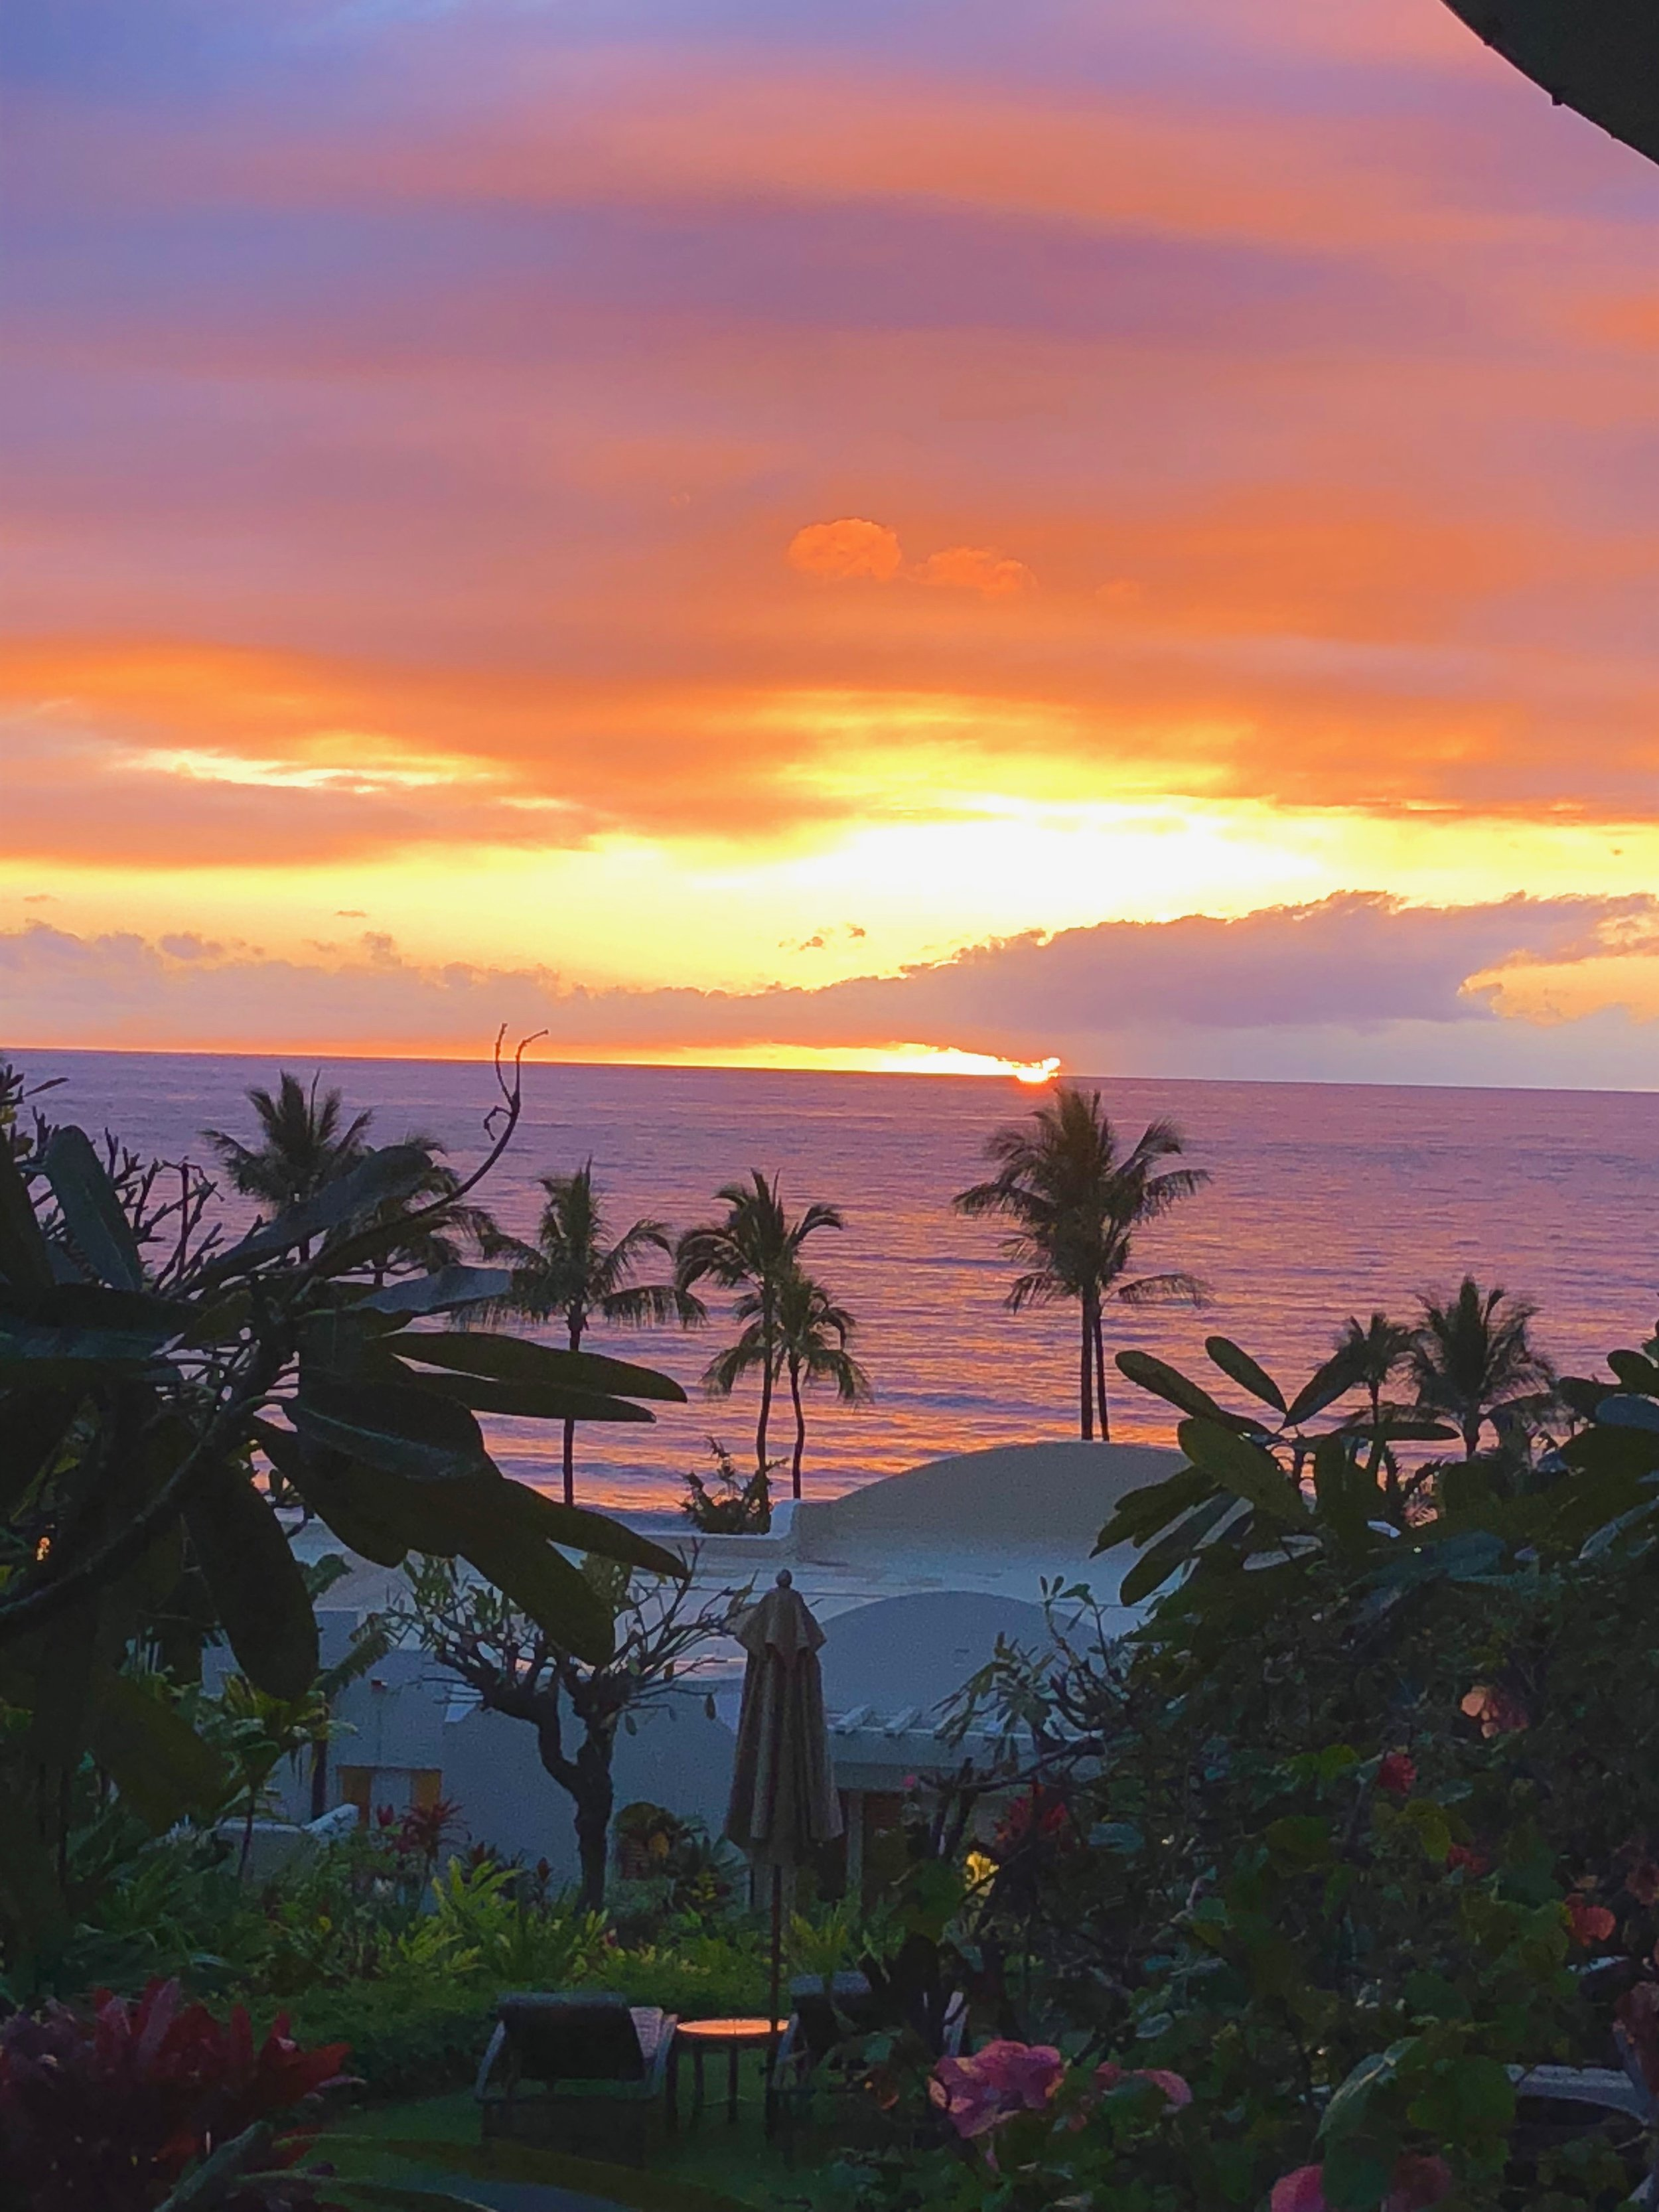 Sunset at Wailea